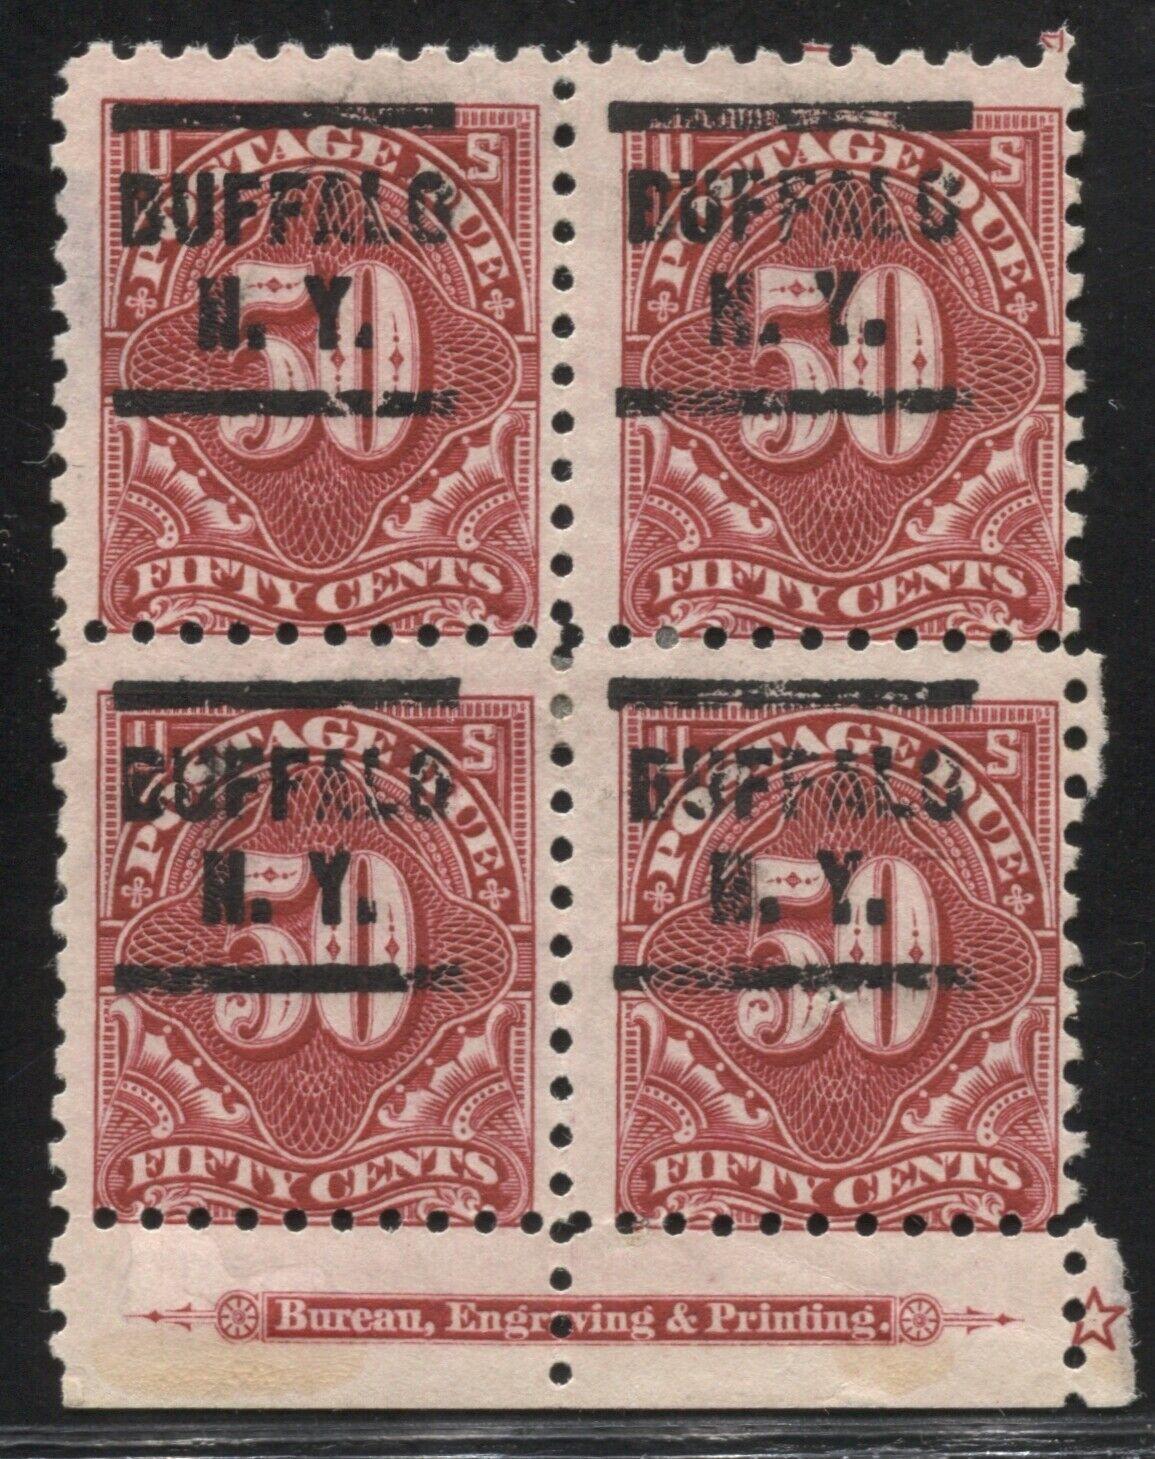 Postage Due J58 block used rare position Avg-Fine flaws inc pinhole 9/27 TJ